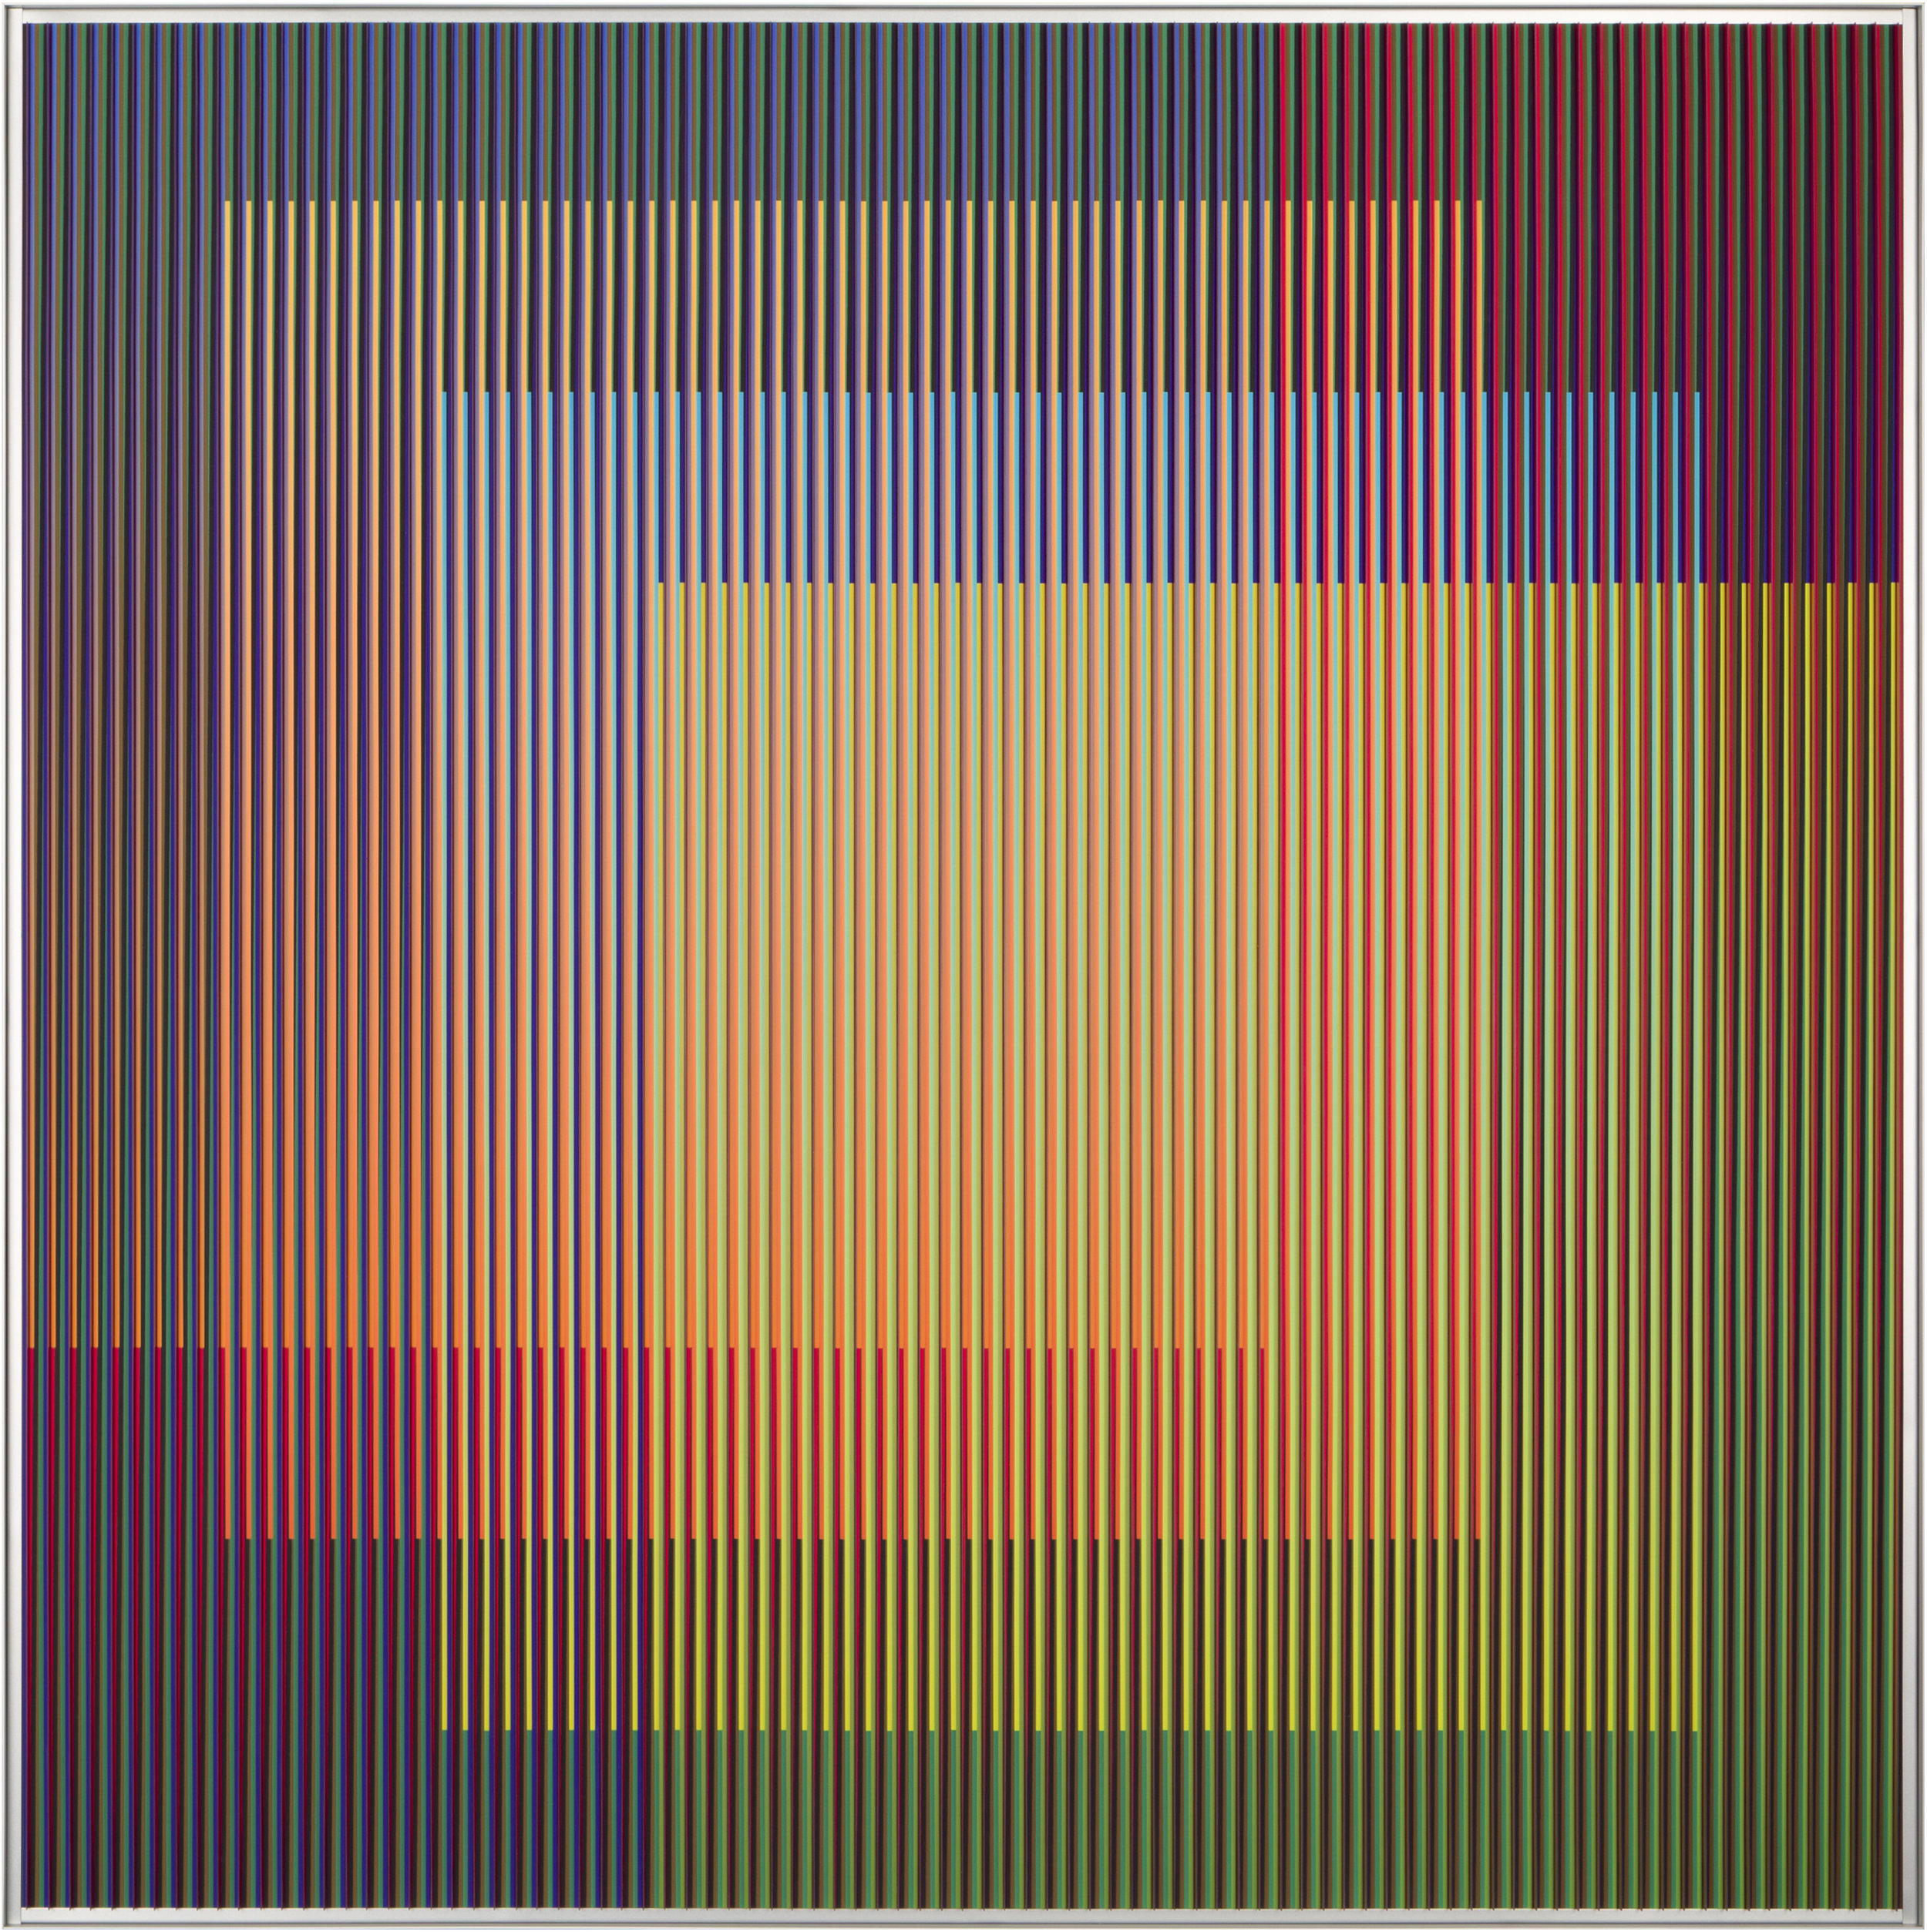 Carlos Cruz-Diez,  Physichromie 1876  (2013), Galerie Pascal Janssens.